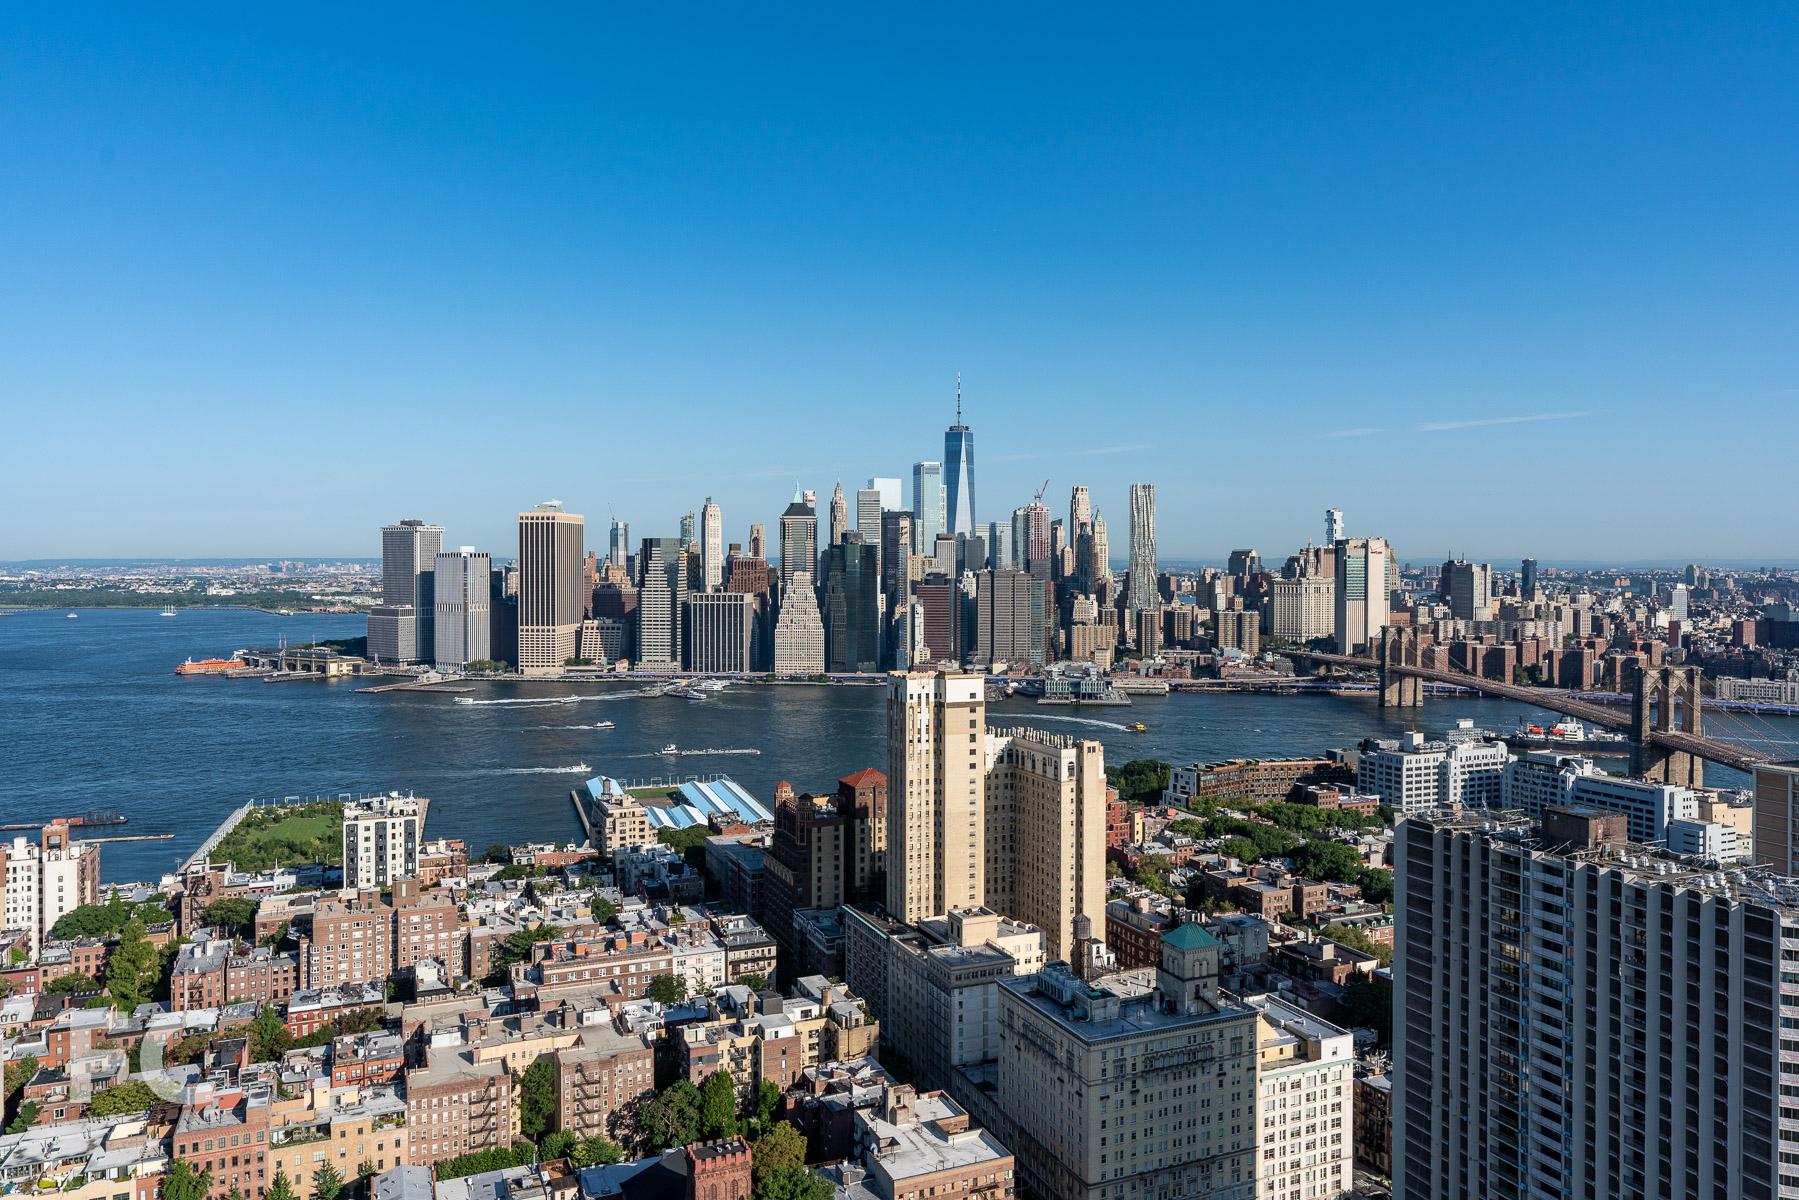 Northwest view towards Lower Manhattan from the top floor.